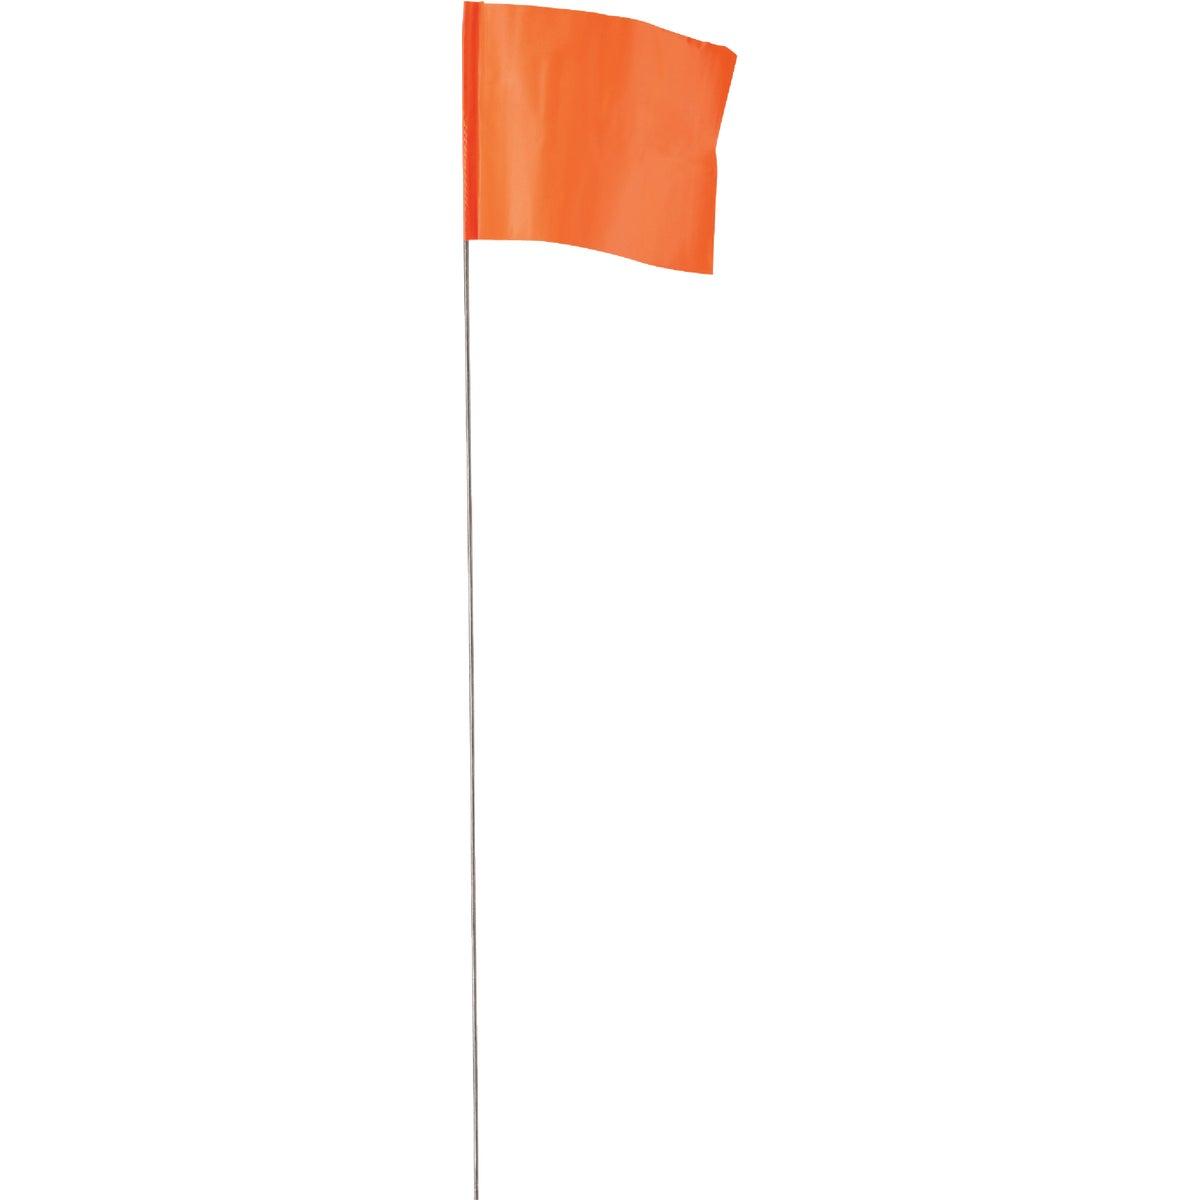 100PK ORANGE FLAGS - 64100 by Irwin Industr Tool